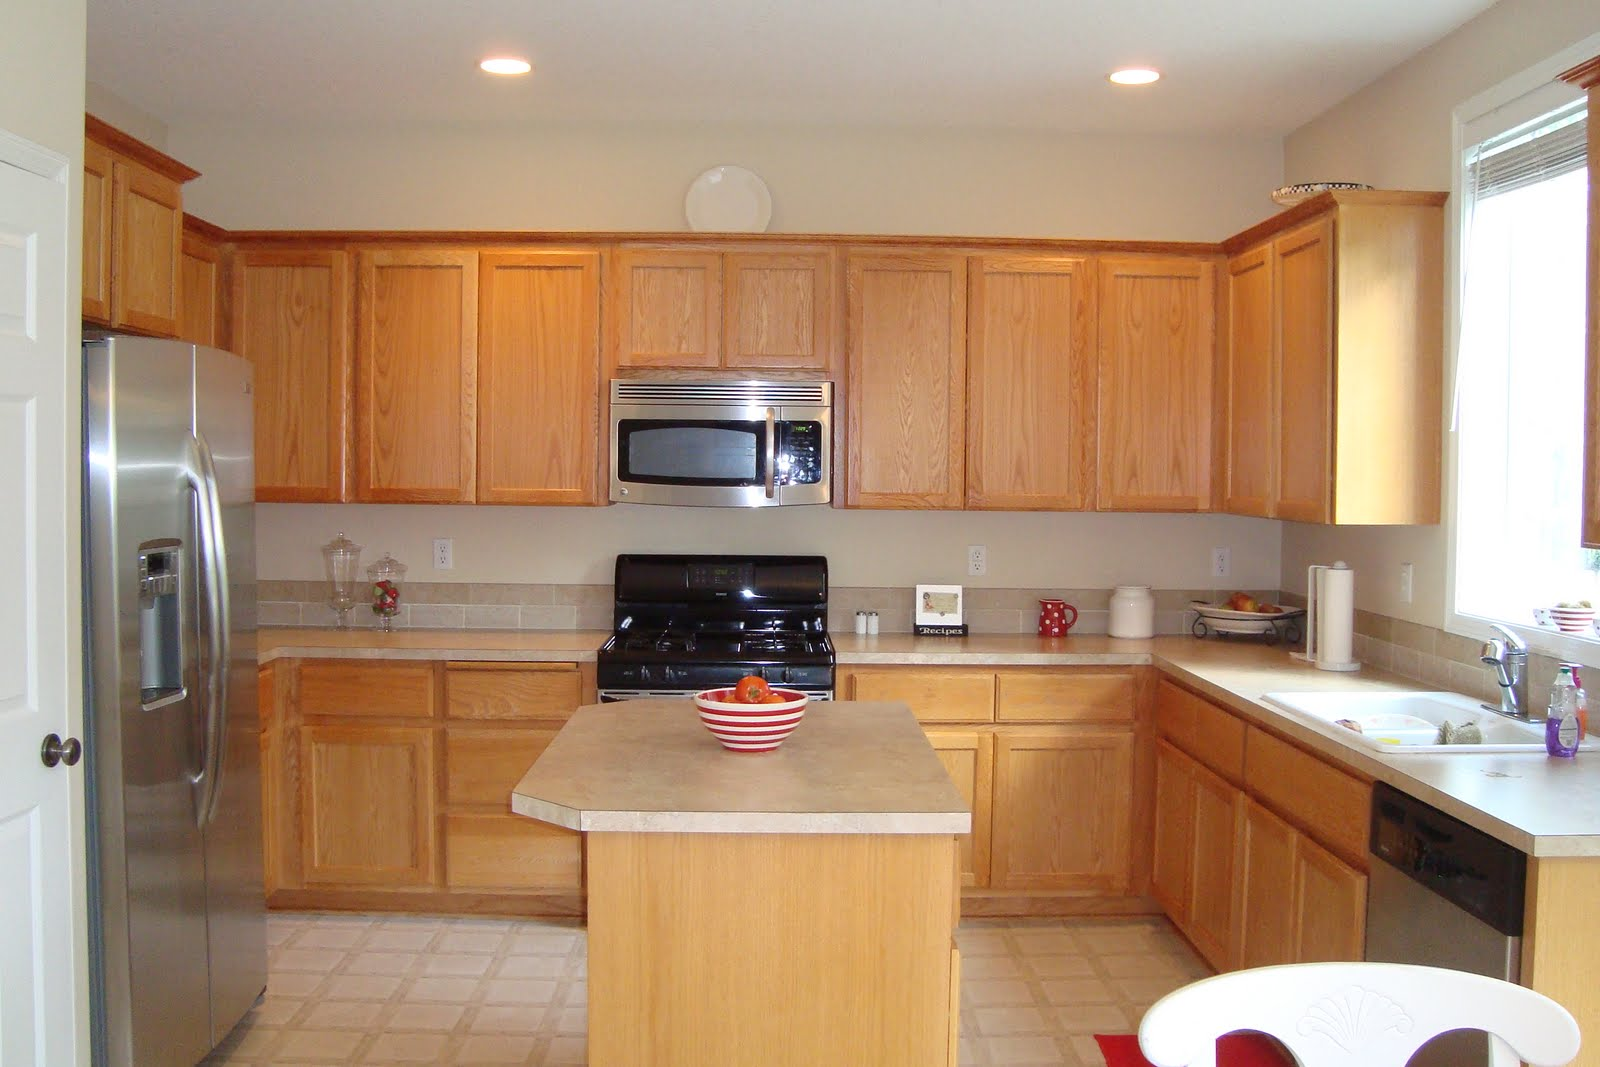 Fantastic Kitchen Pantry Cabinet Design Audreycouture